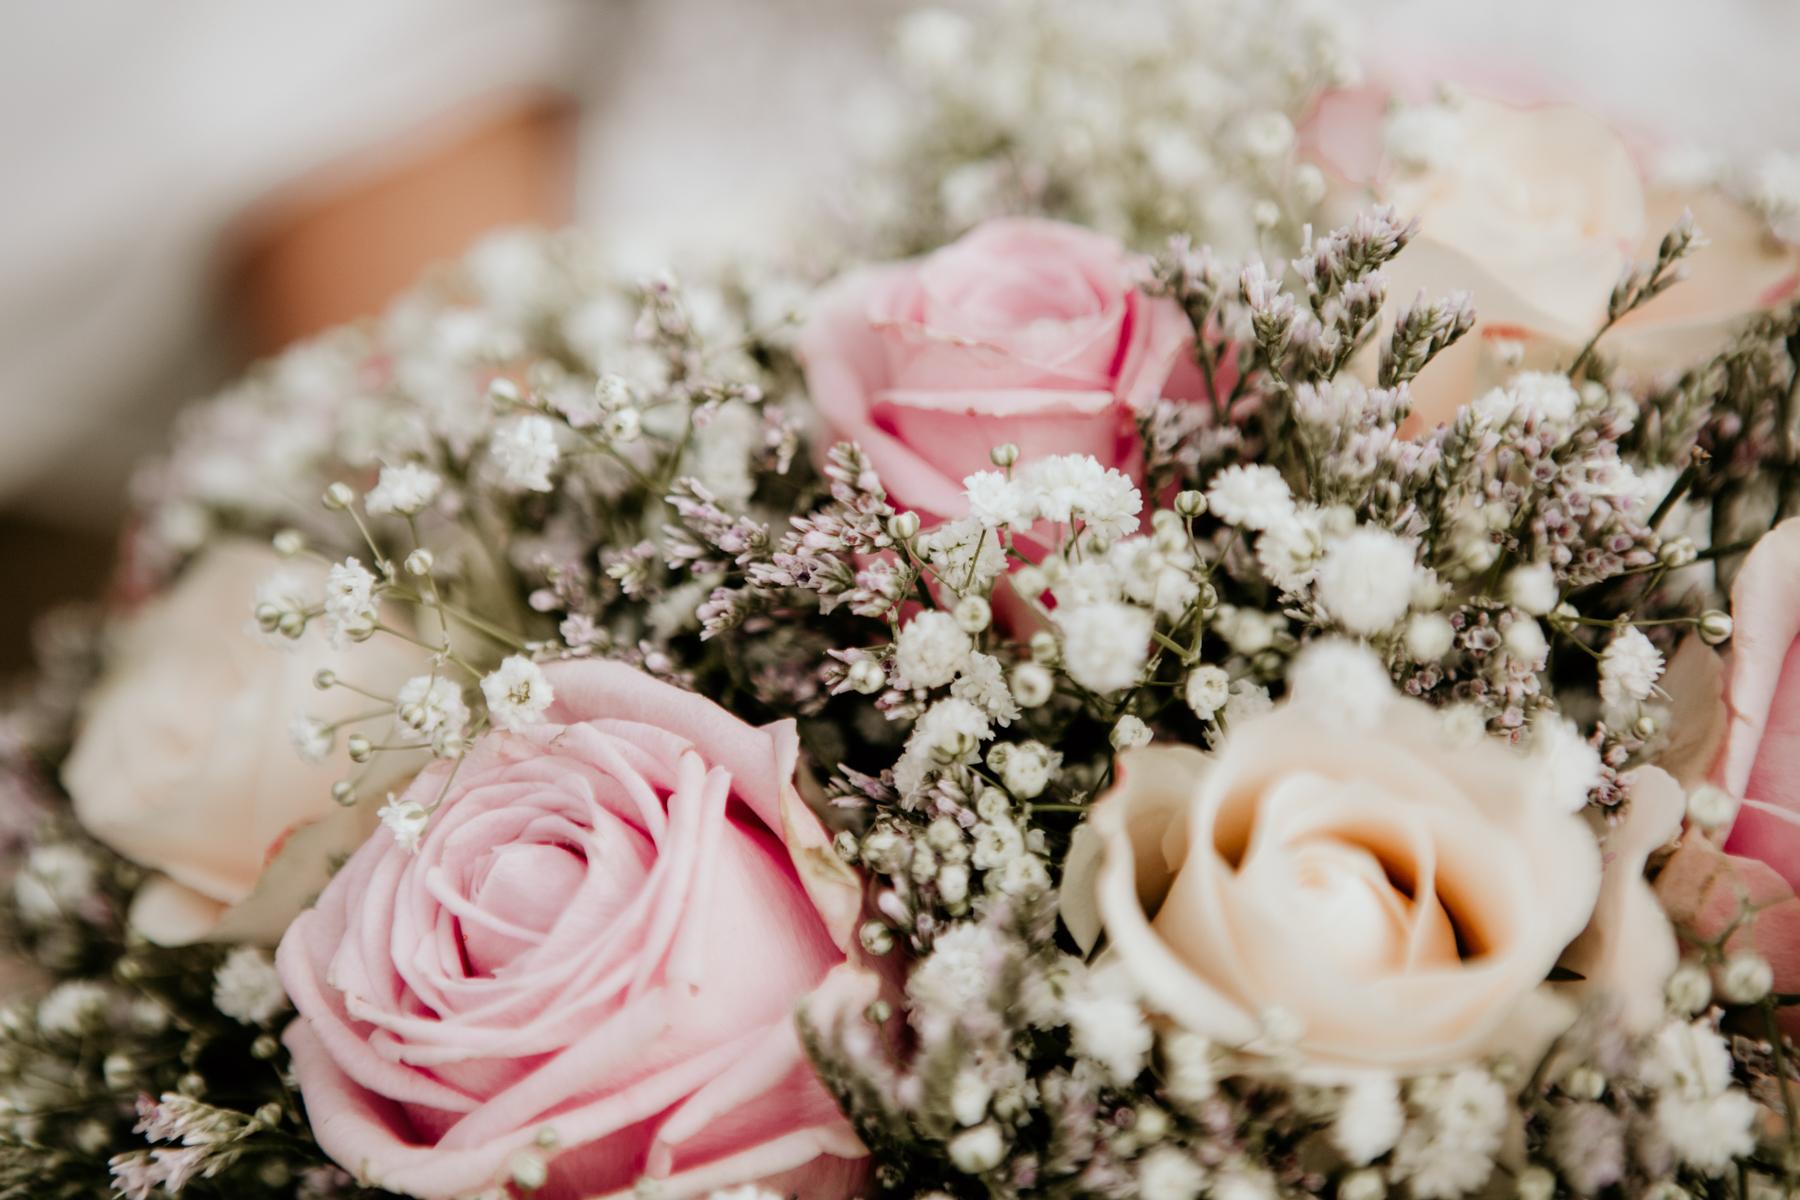 Styled Wedding 1 beeld.schoon-selinderella klein formaat-20